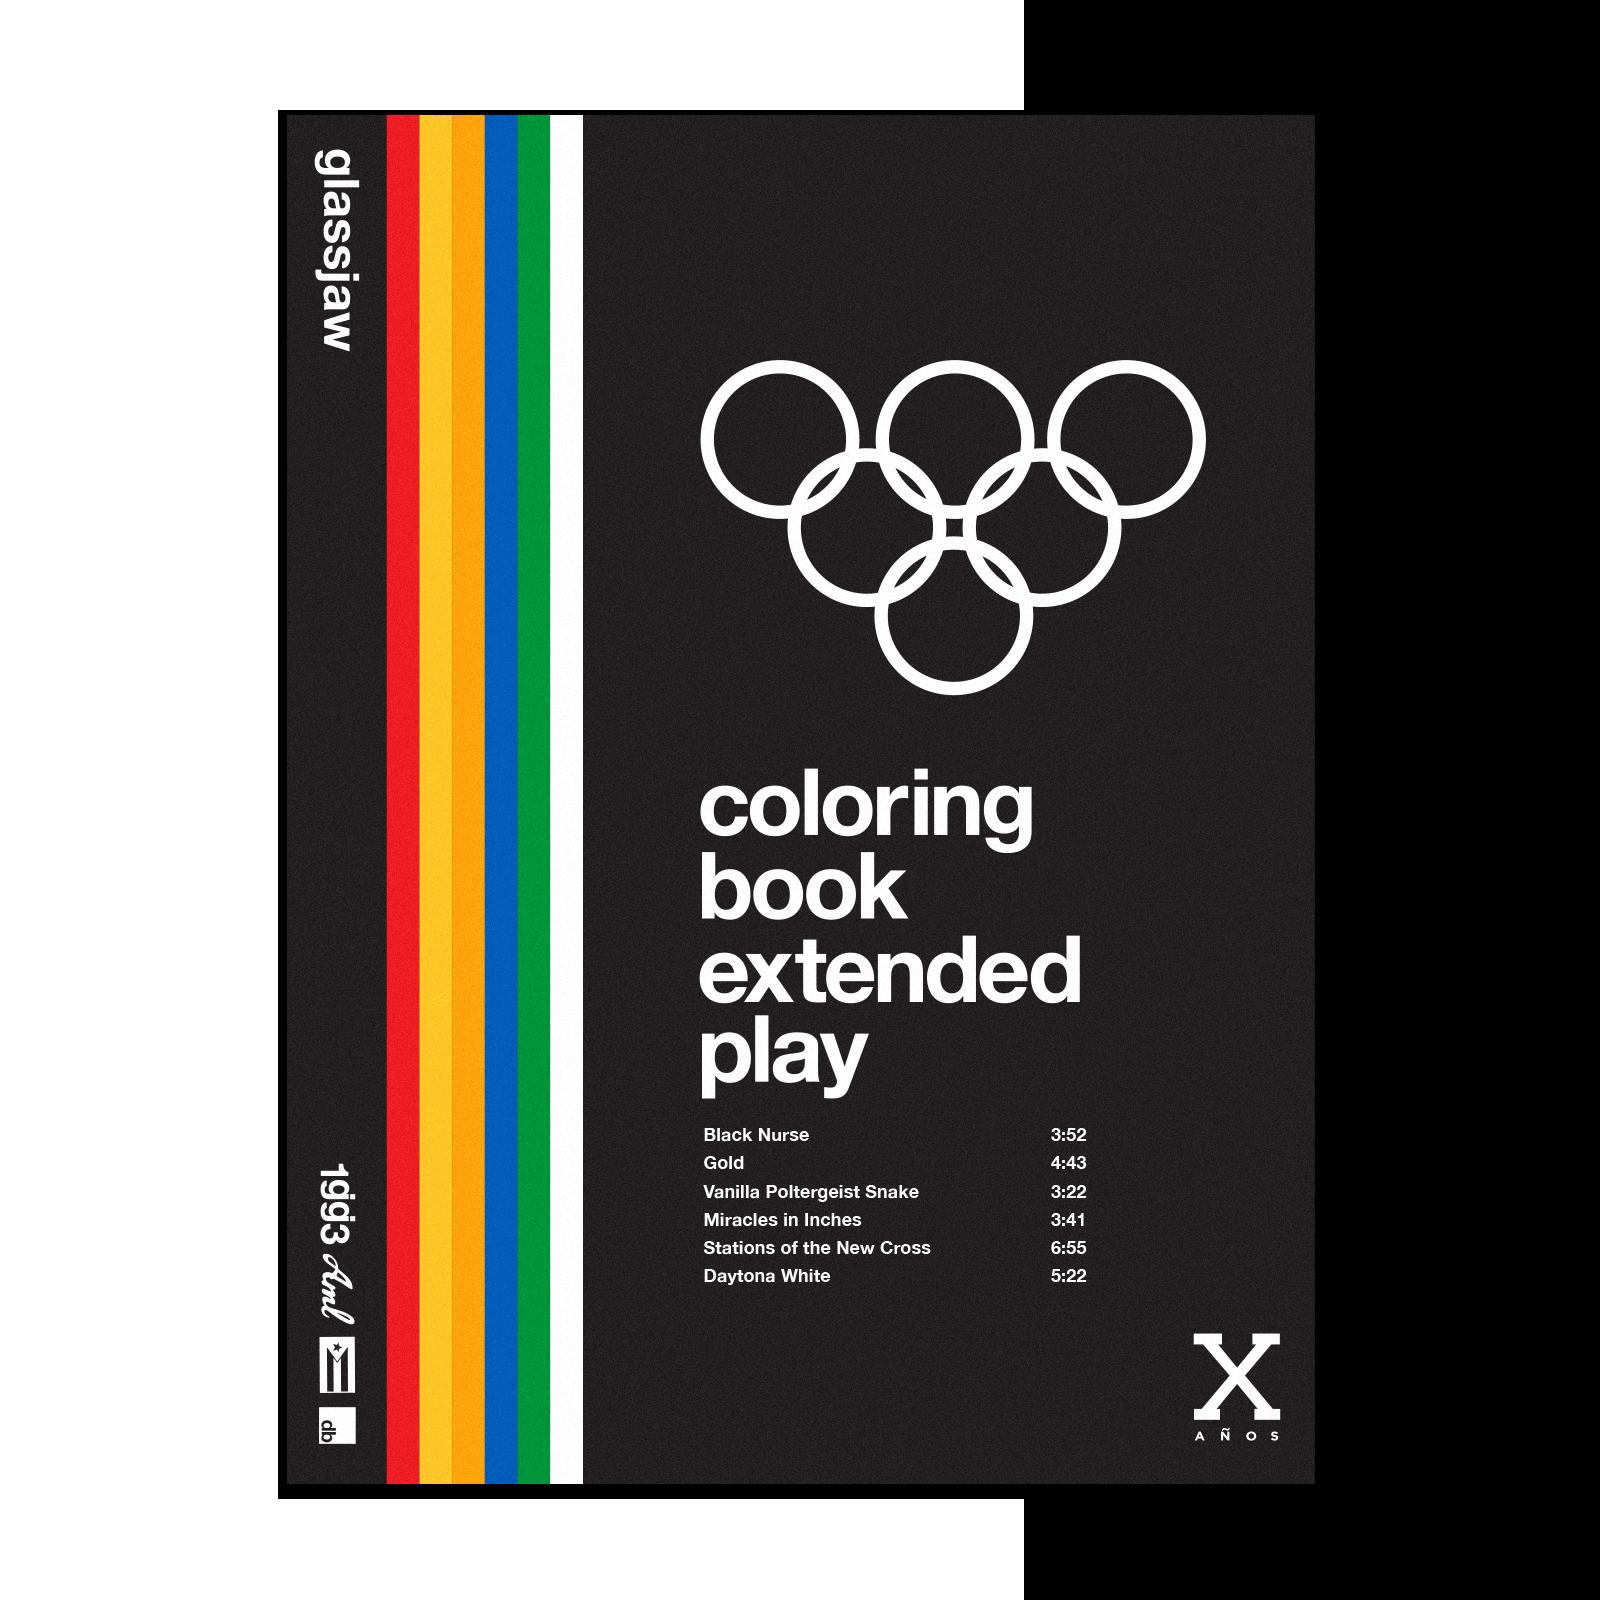 Coloring Book Vinyl - Orange, Clear, Blue